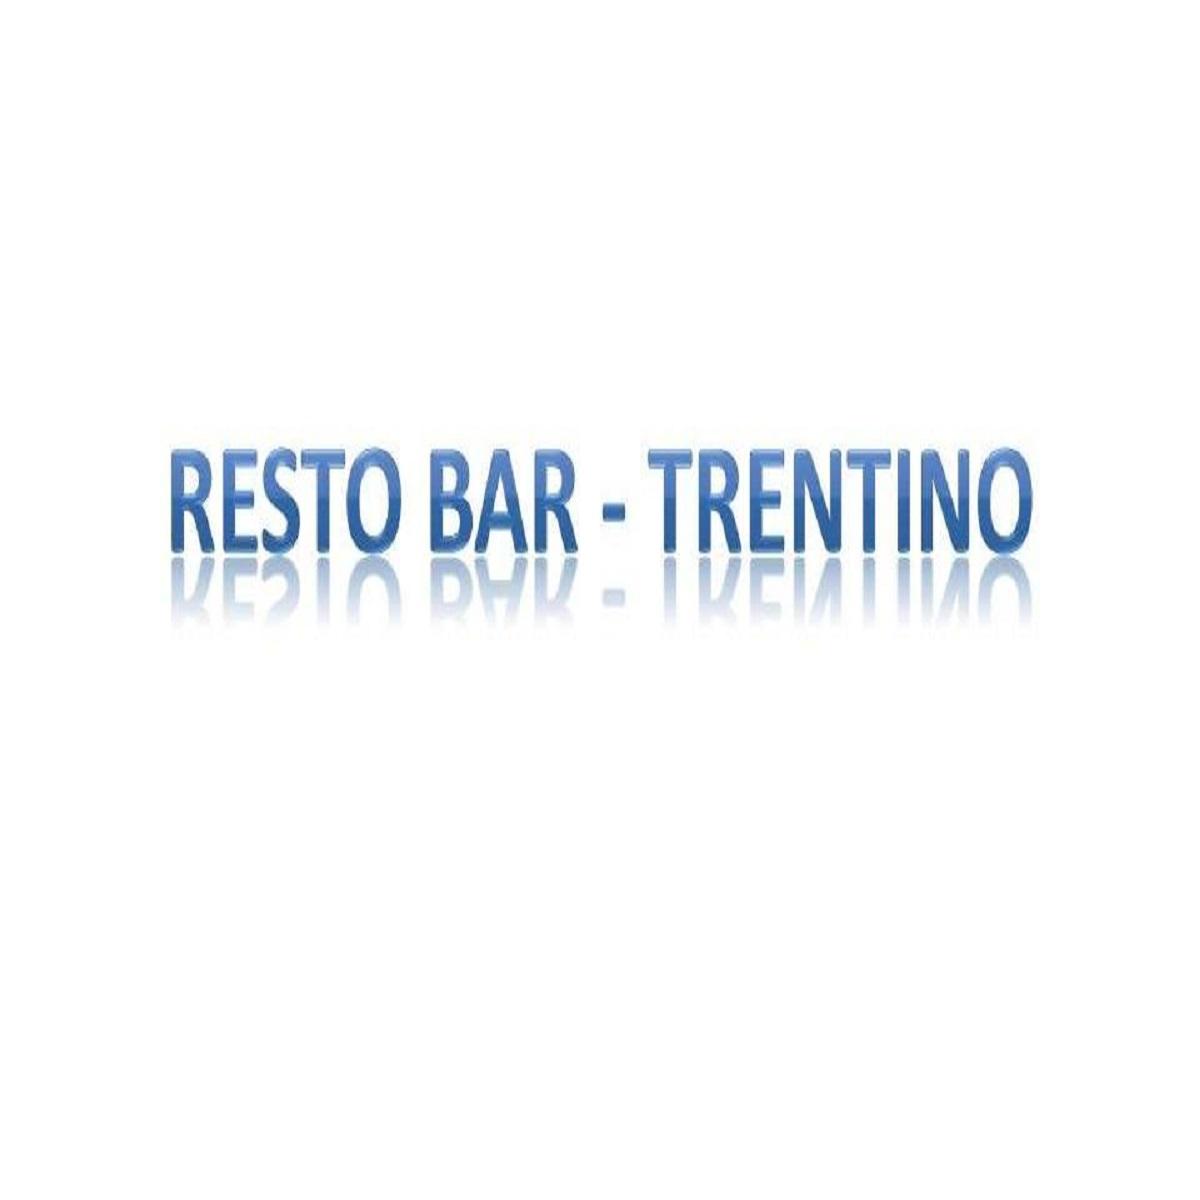 RESTO BAR - TRENTINO